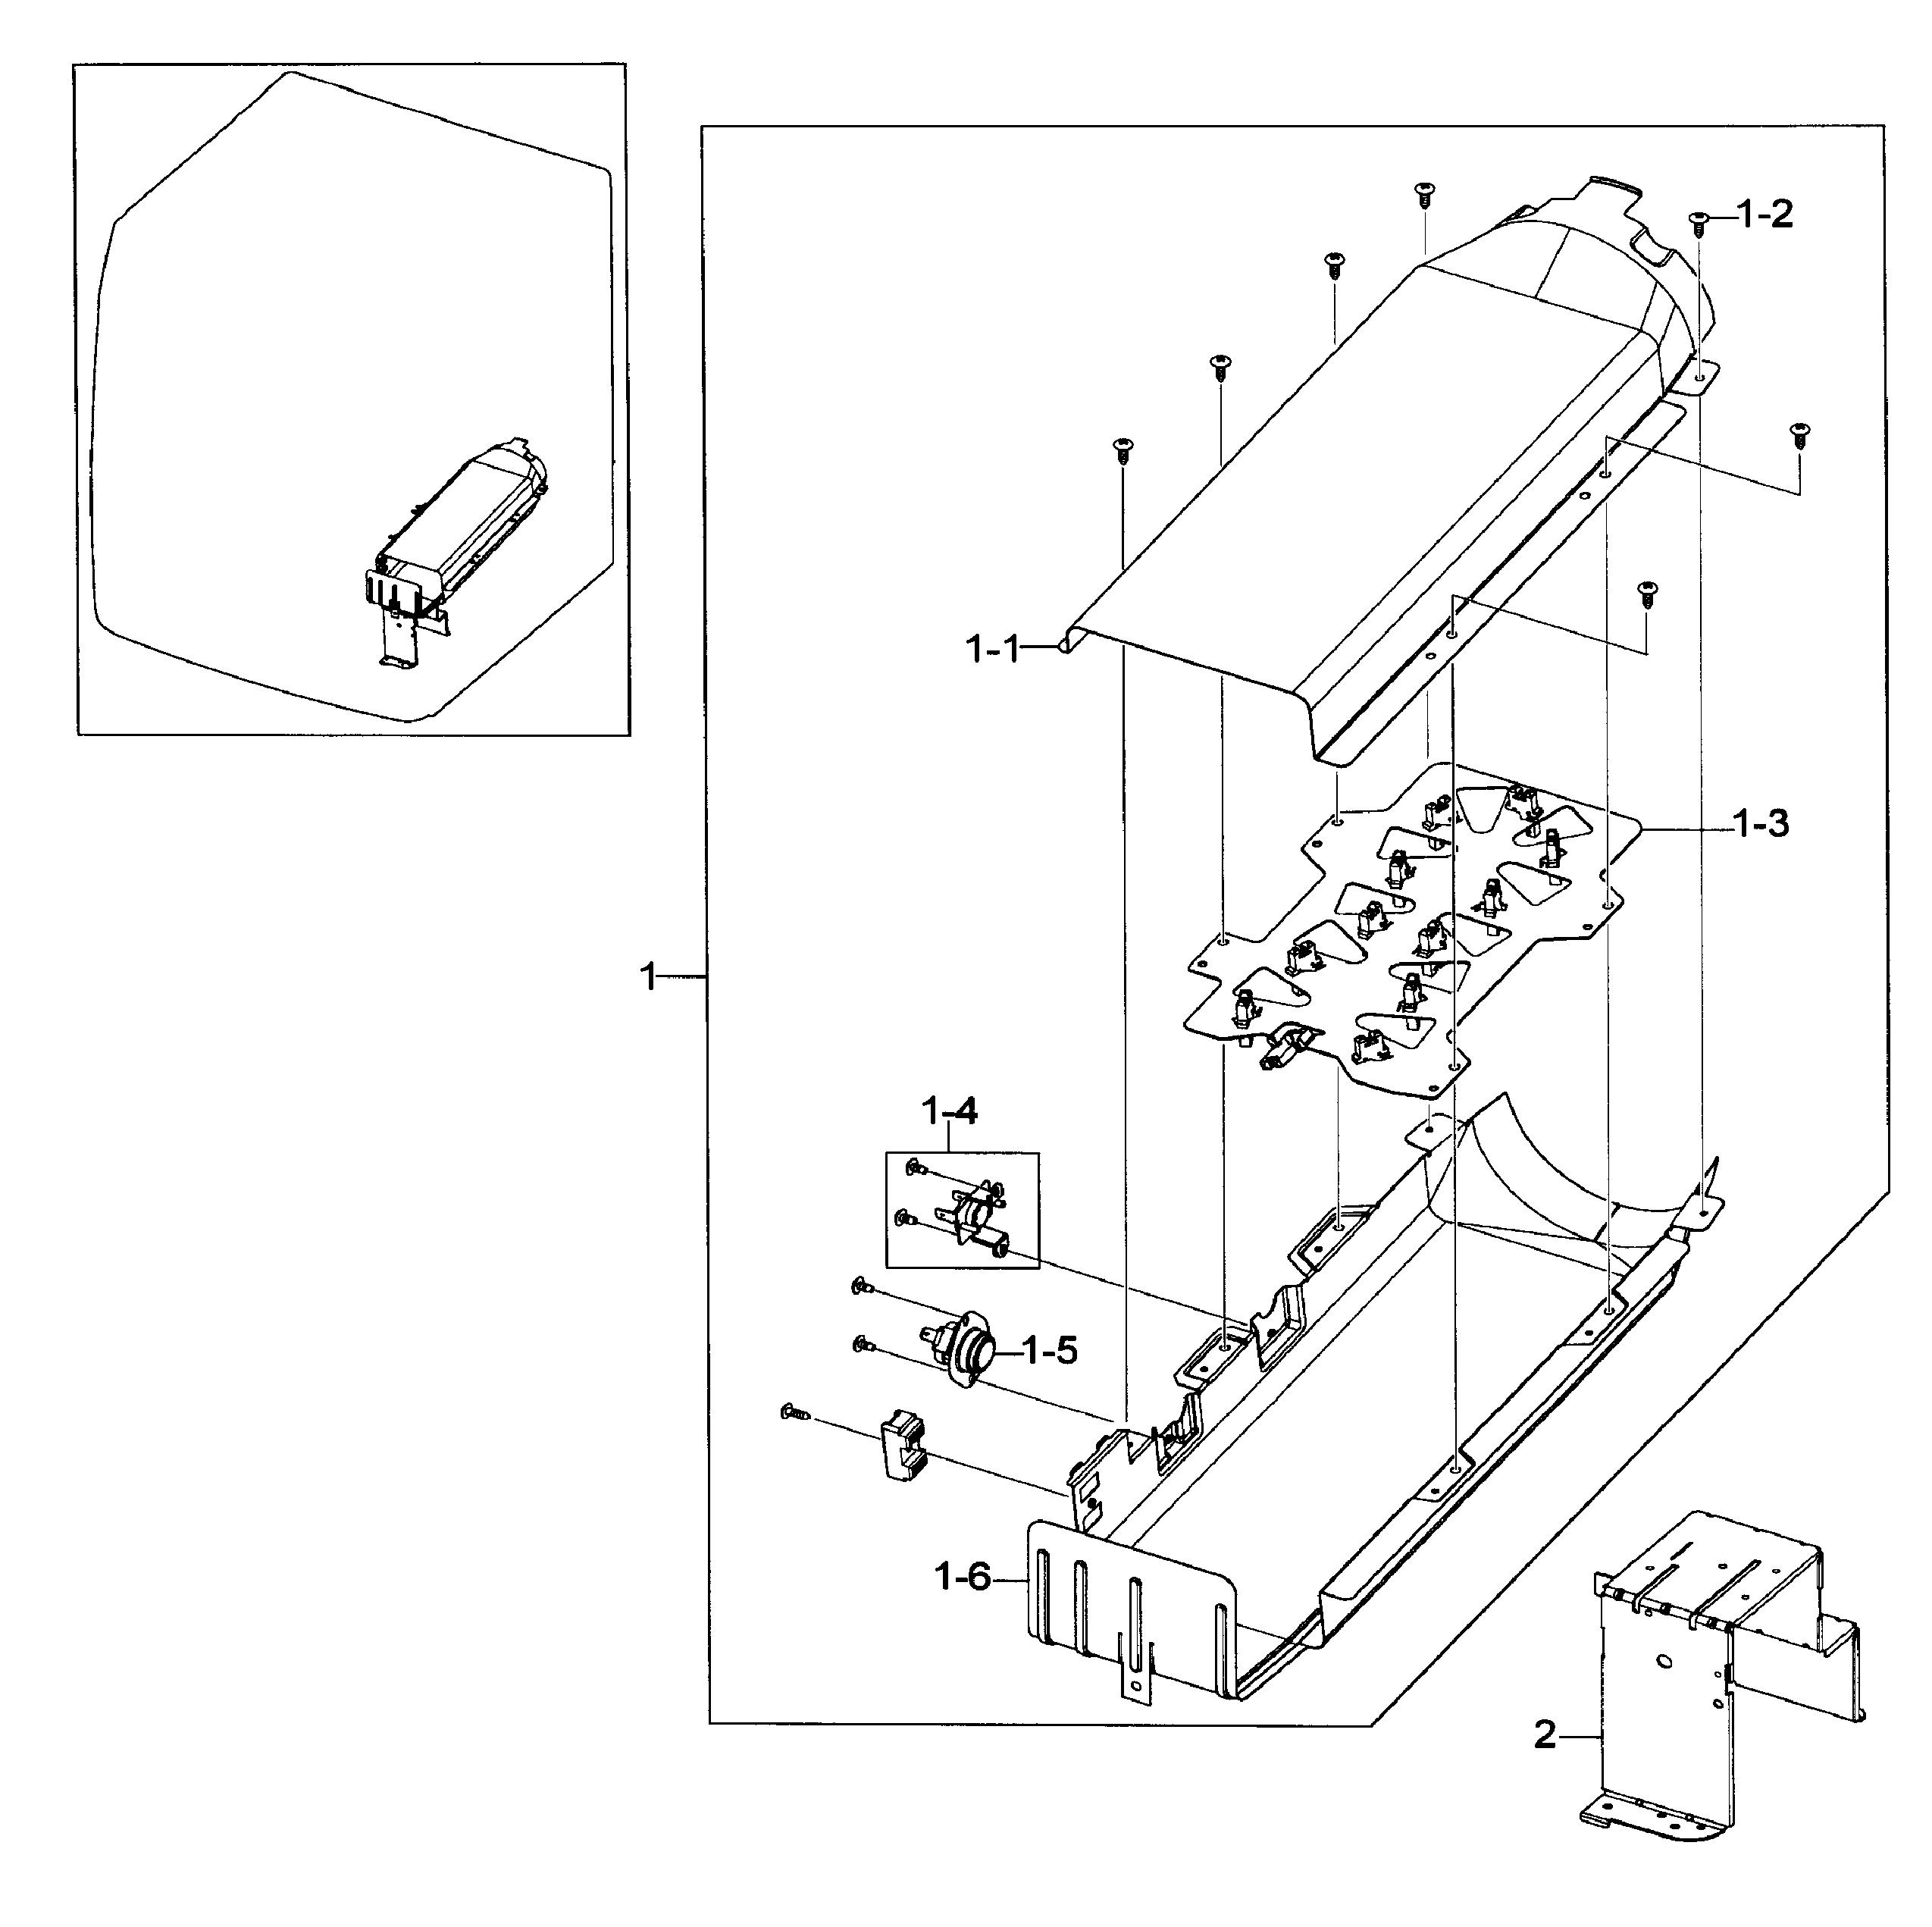 Heater Assy Diagram Amp Parts List For Model Dv419aeuxaa